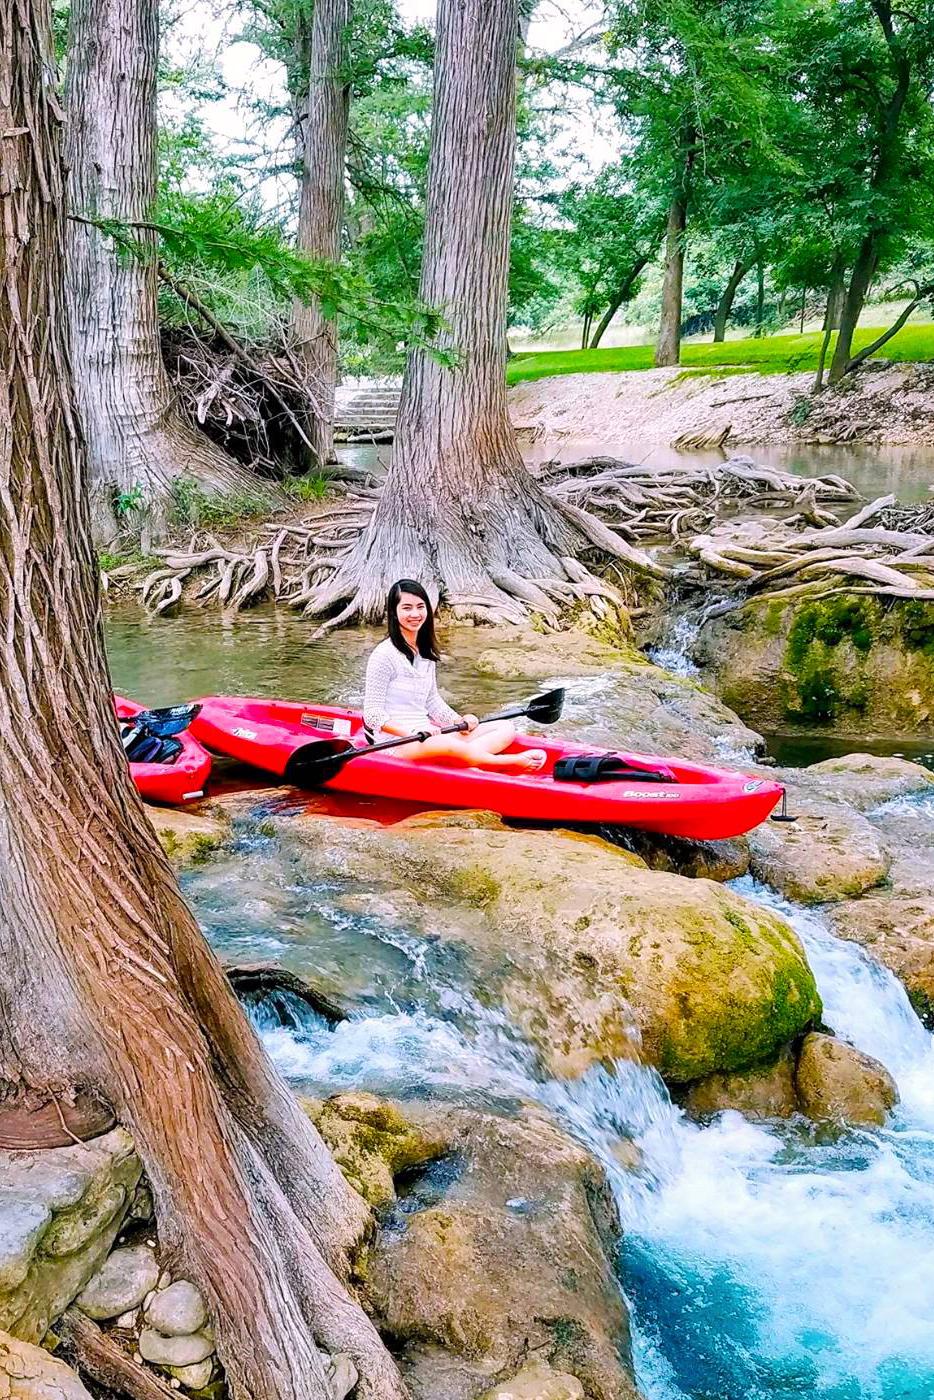 Sabrina Jones Kayaking on the Medina River in Texas.